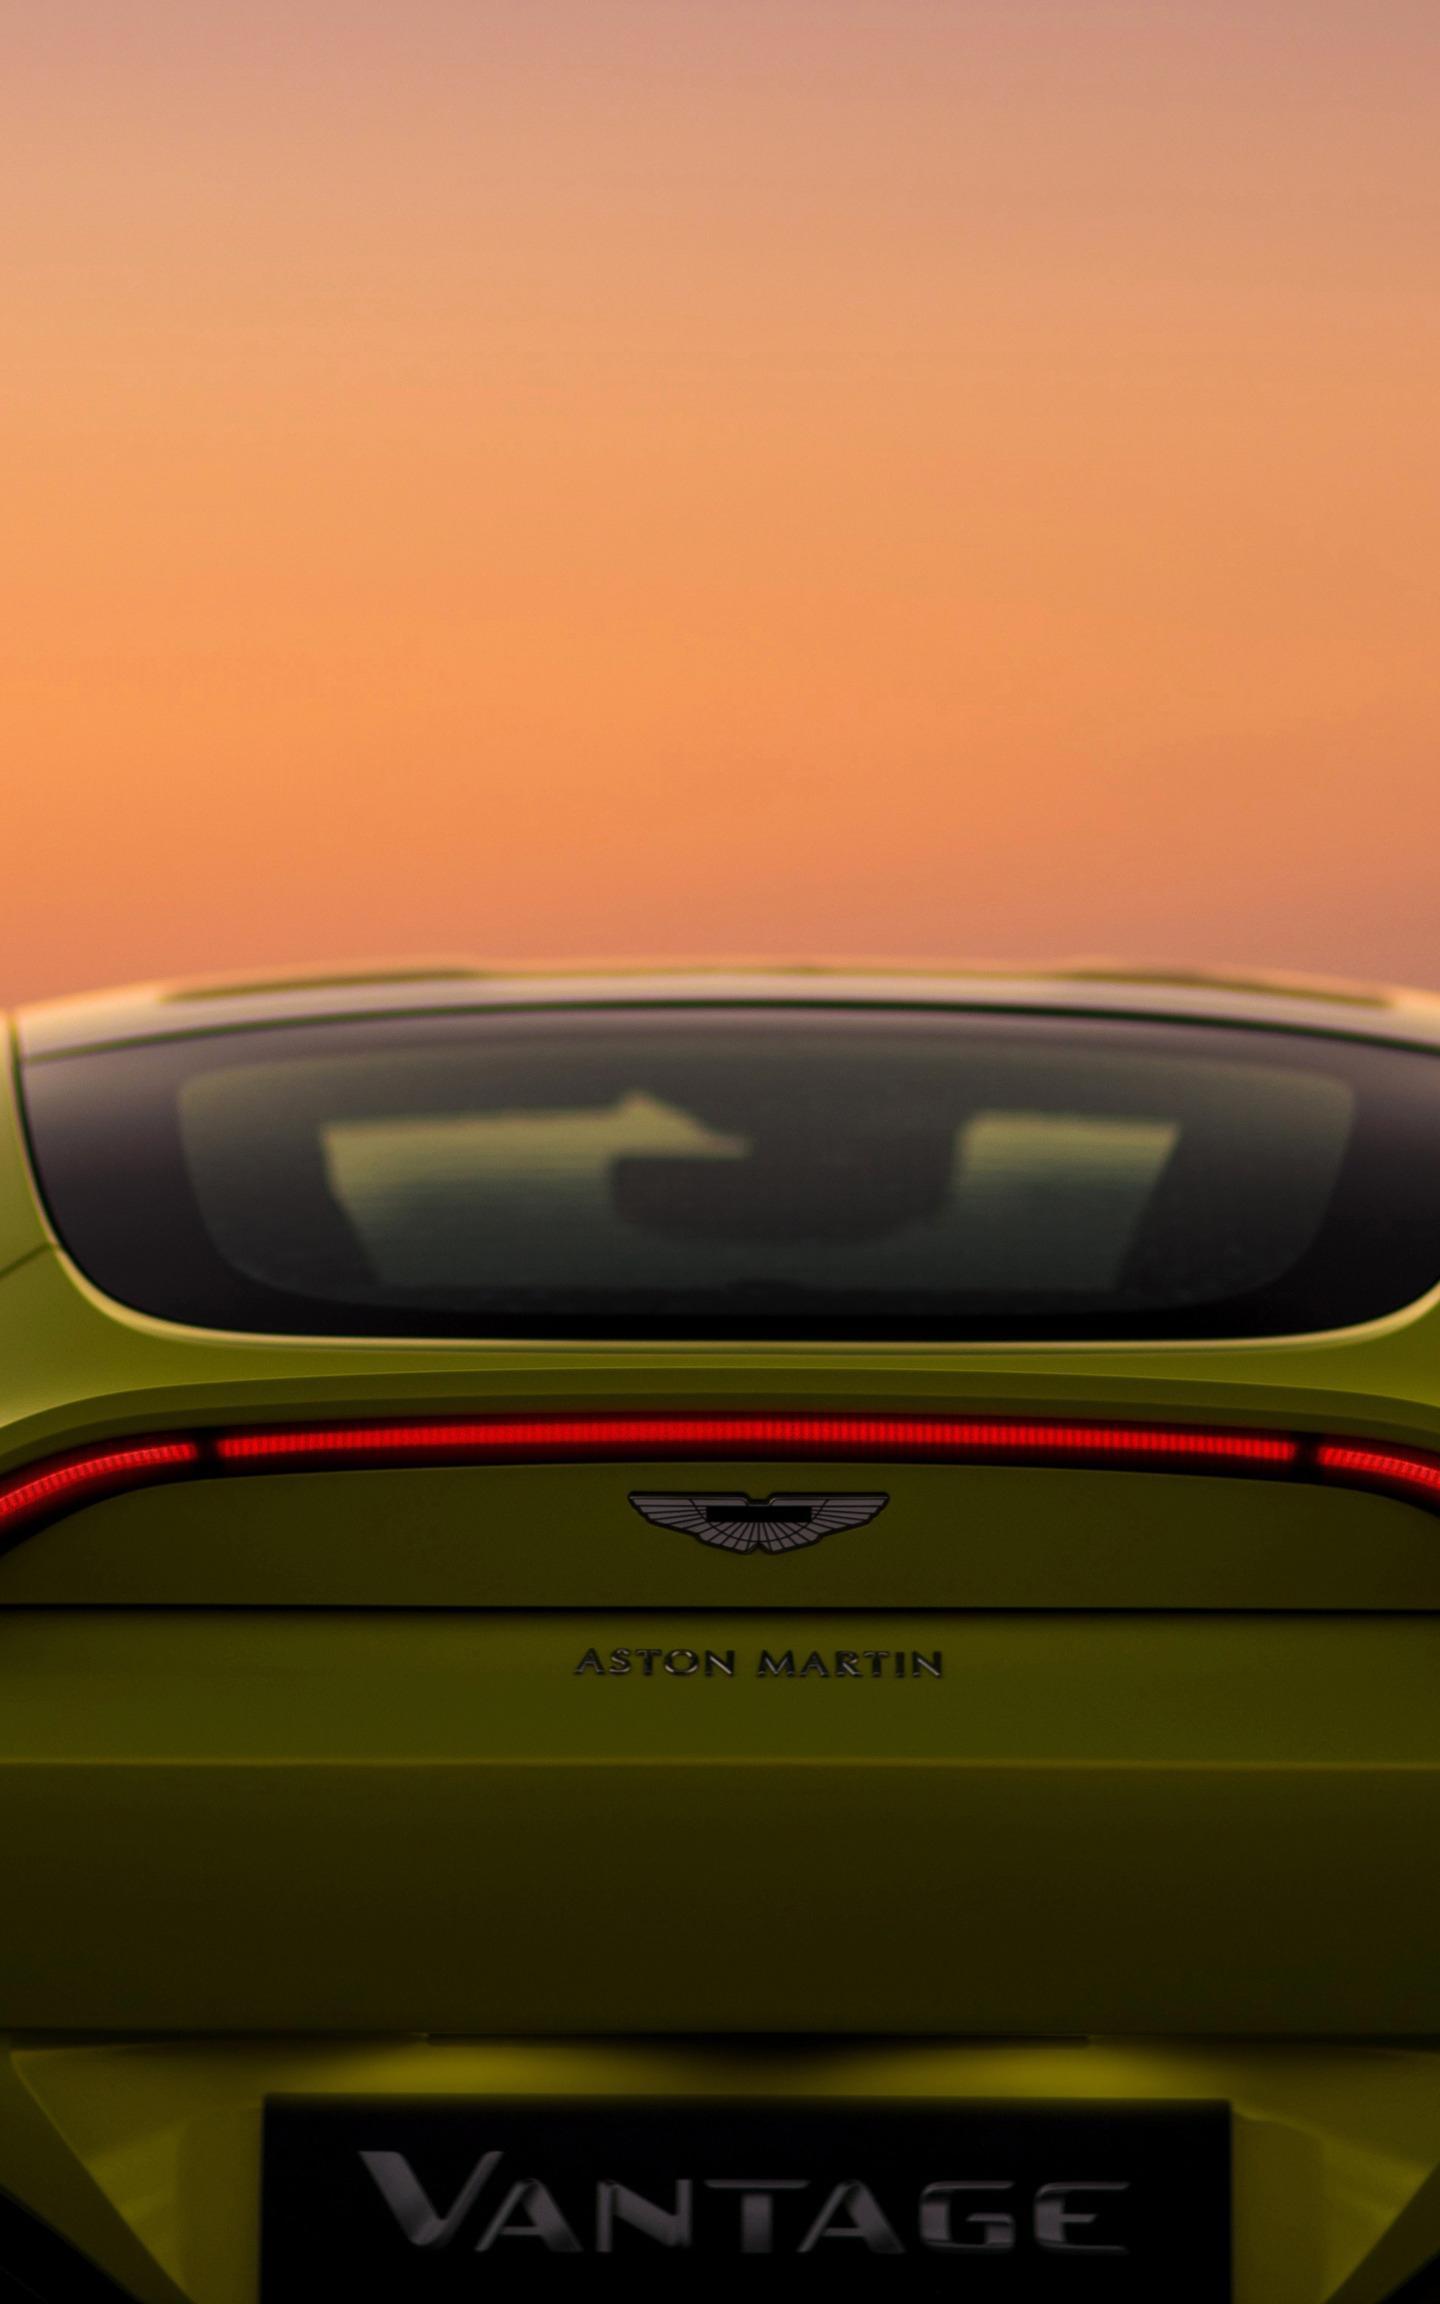 Download 1440x2880 Wallpaper Aston Martin V8 Vantage 2018 Car Rear Lg V30 Lg G6 1440x2880 Hd Image Background 1021